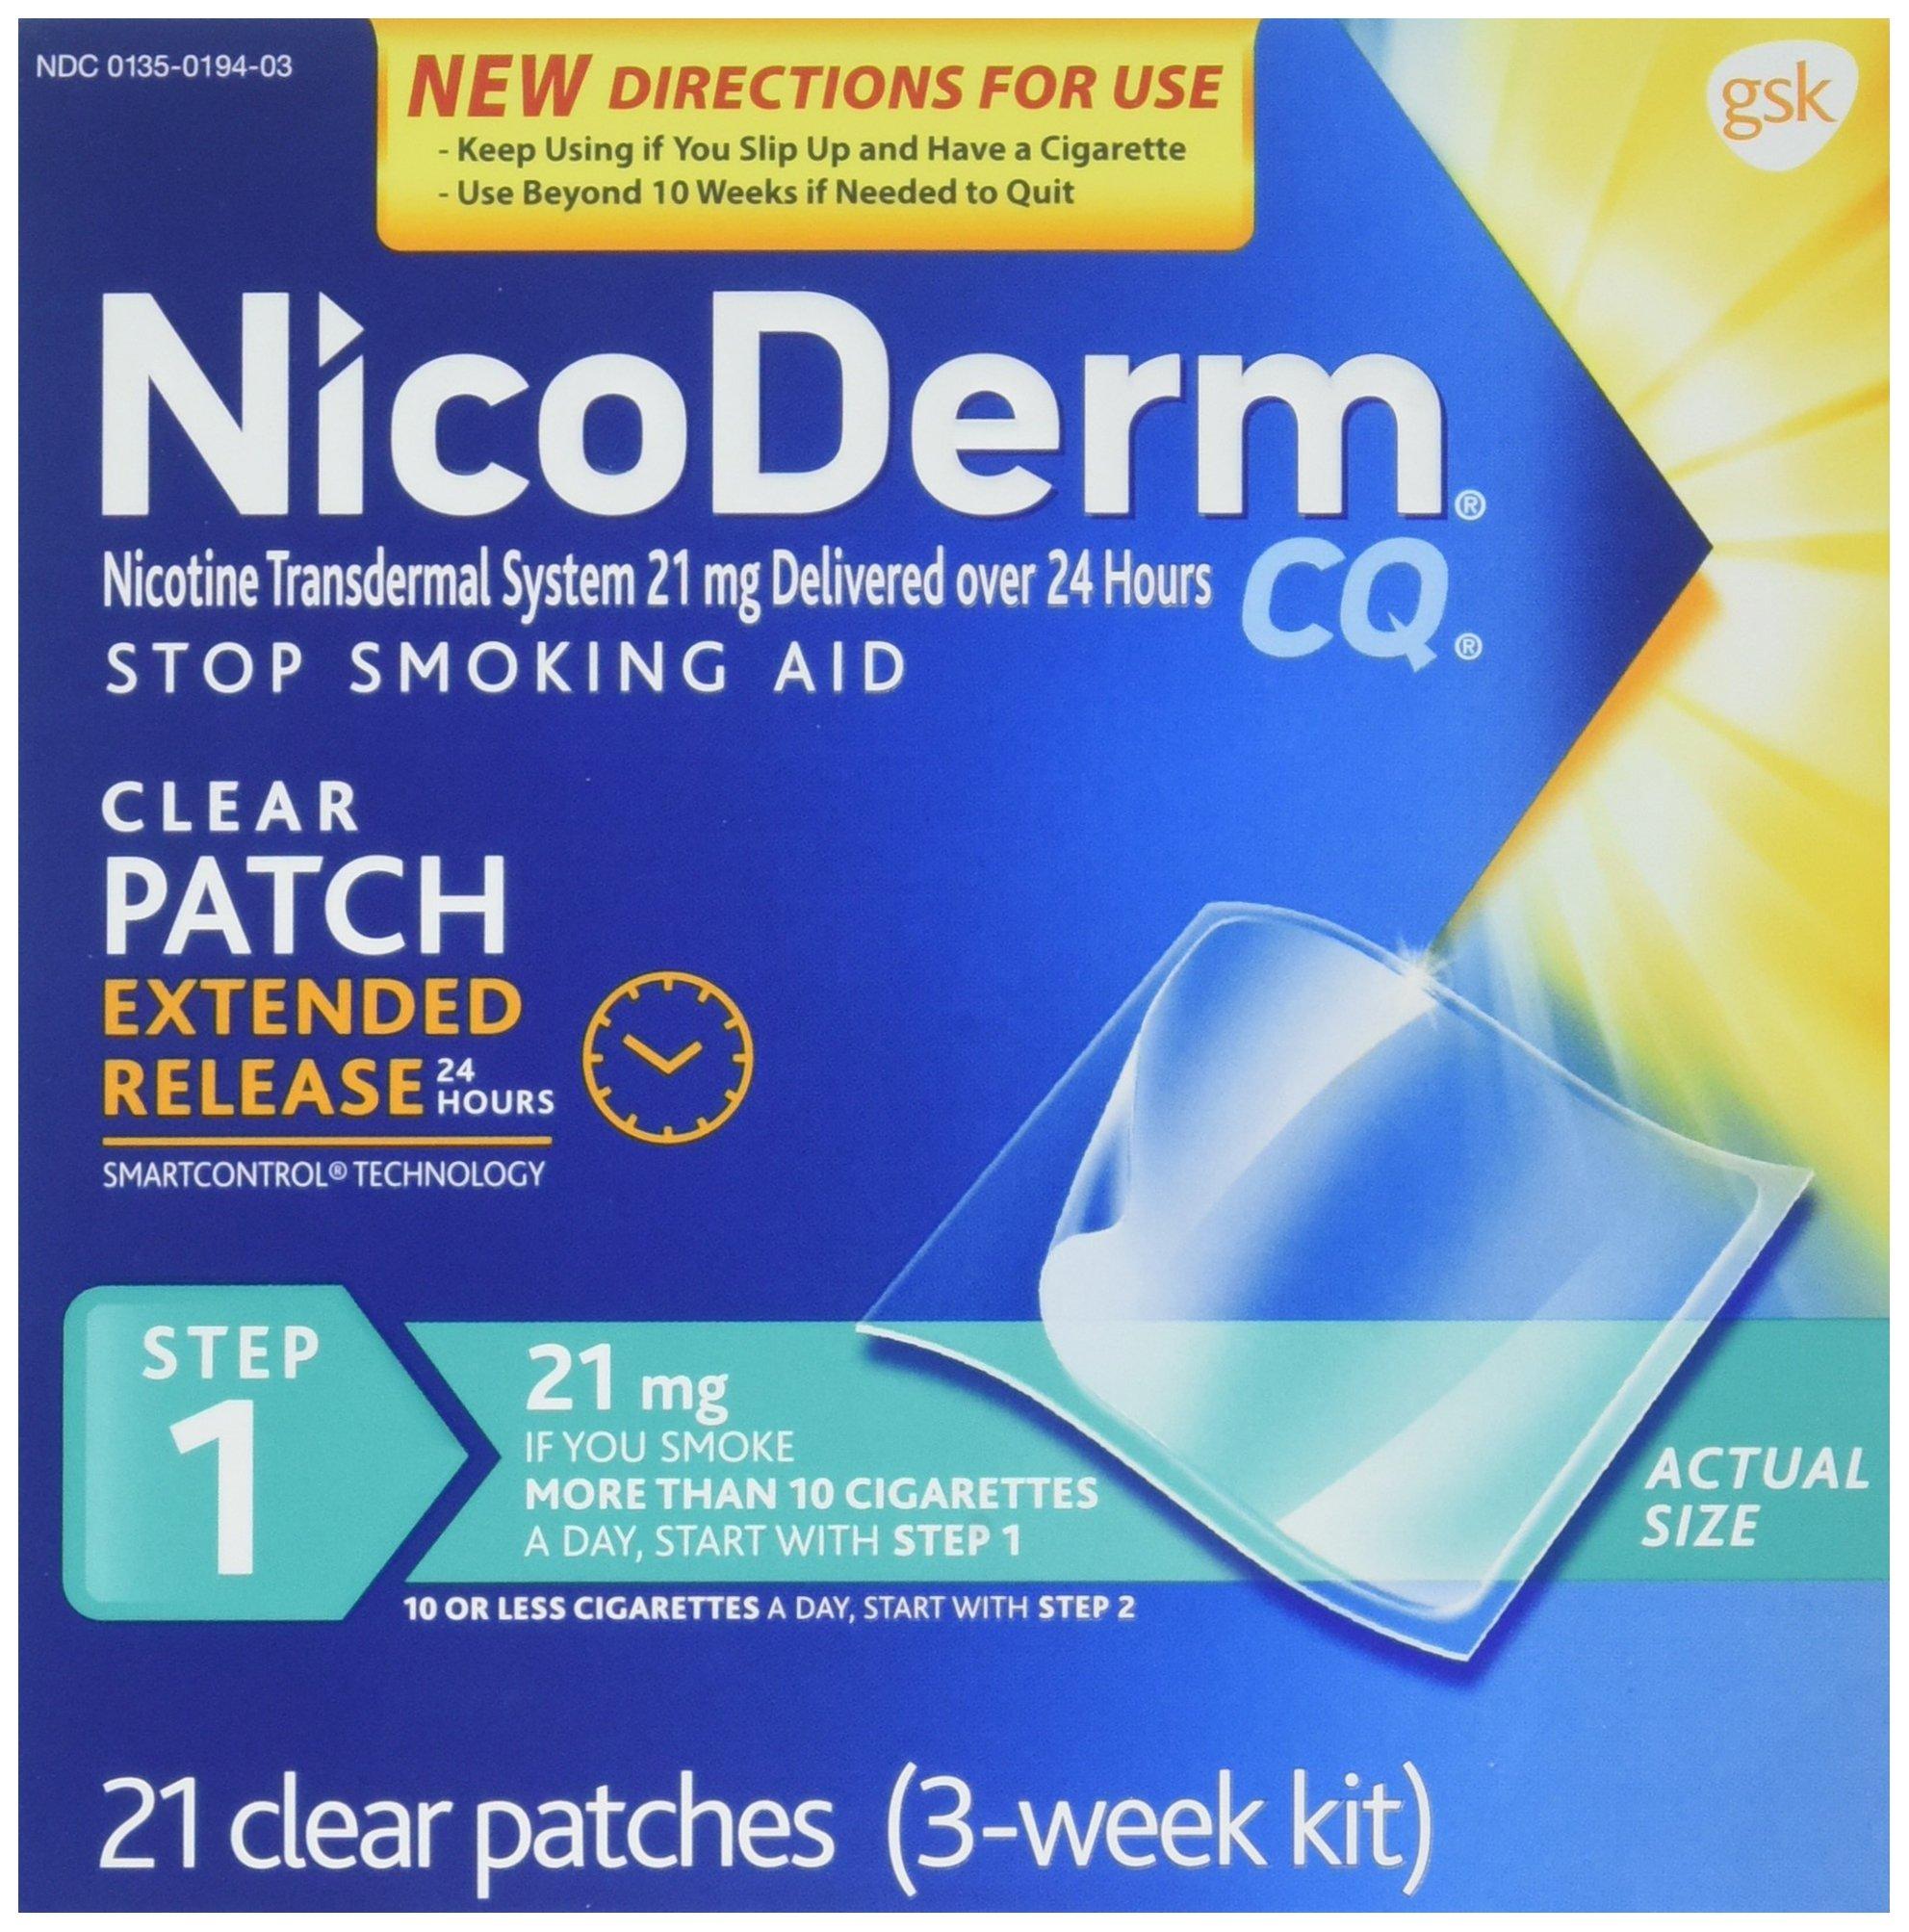 NicoDerm CQ STEP 1 - 3 Week Kit - 21 Clear Nicotine Patches by NicoDerm CQ